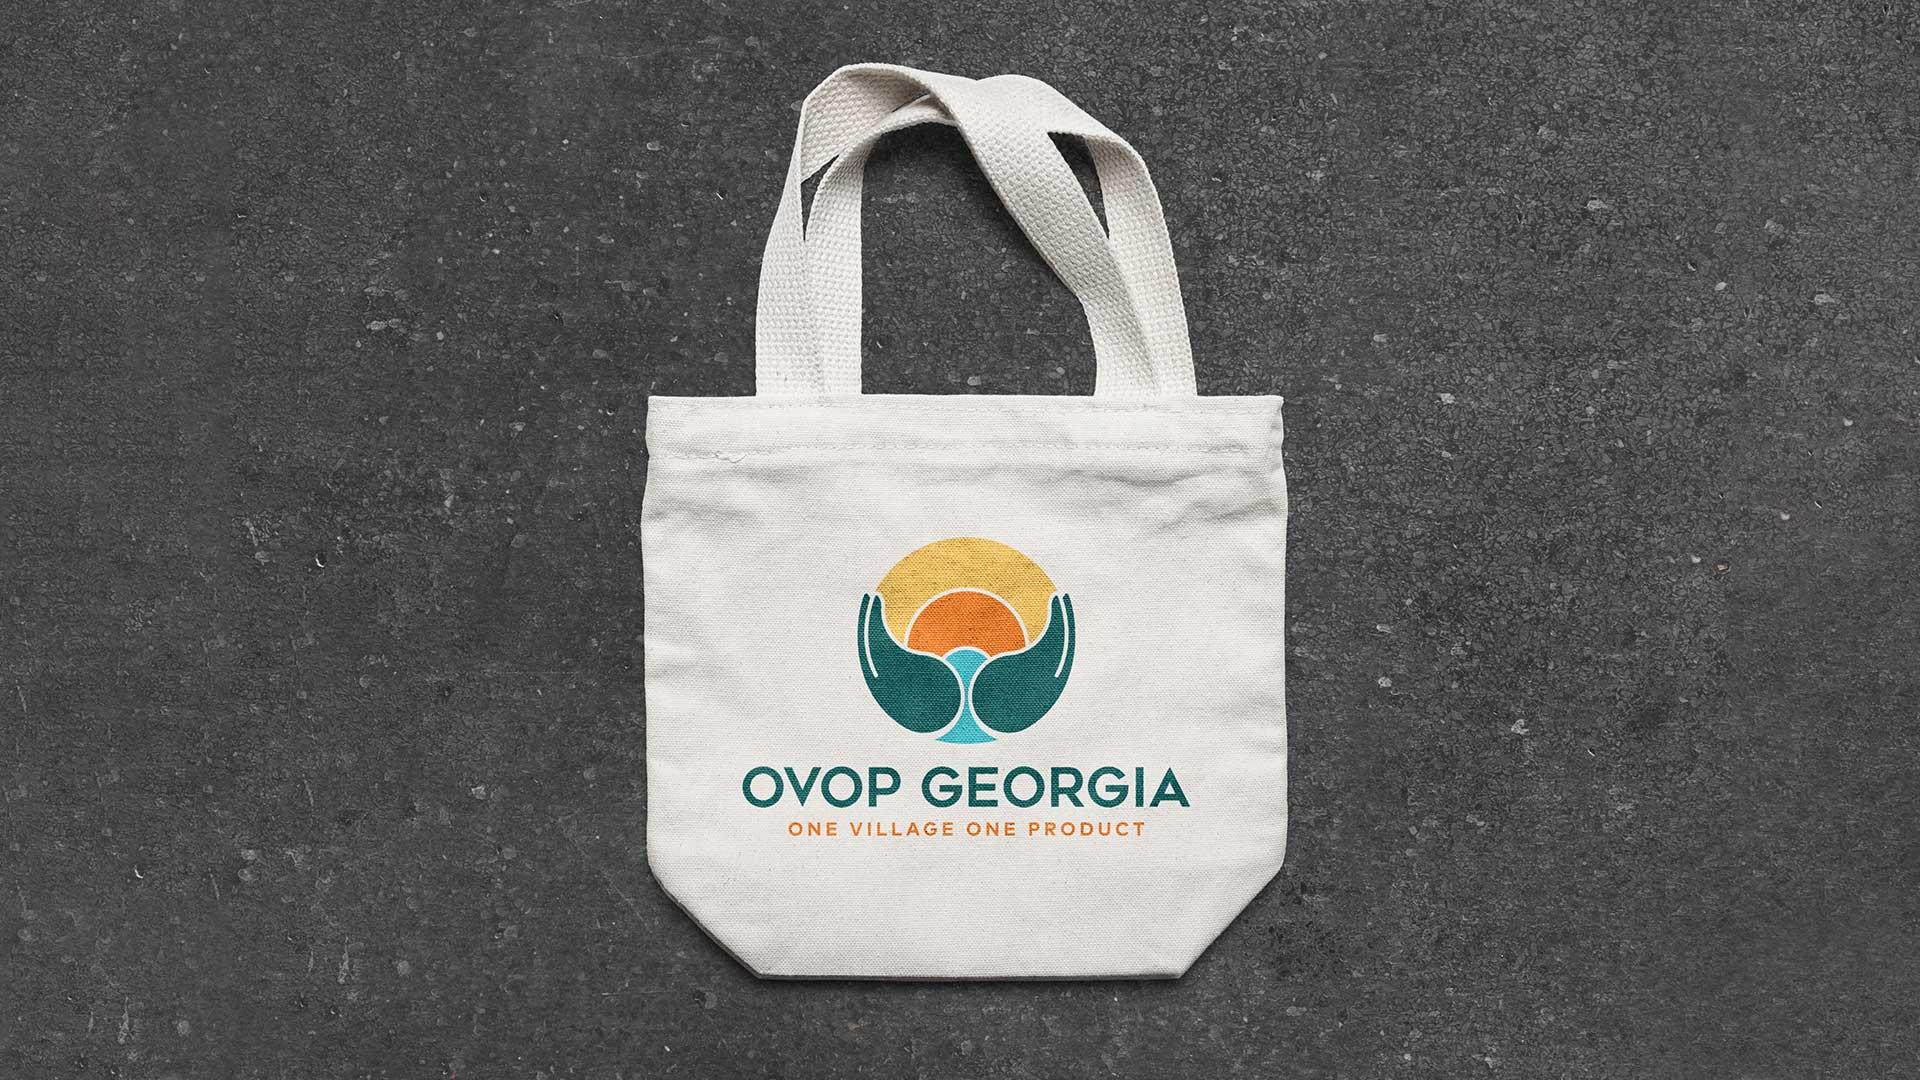 Brandit   OVOP Georgia - ლოგოს დამზადება, ლოგოს დიზაინი, ლოგოების შექმნა, ლოგოების დამზადება, ლოგოს დამზადების ფასი, ბრენდინგი, ბანერების დამზადება, ლოგოტიპის შექმნა, ლოგოტიპების დიზაინი, ოპტიმიზაცია, facebook დიზაინი, ვებგვერდის დიზაინი, ლოგოების დიზაინი, ლოგოტიპების დამზადება, saitebis damzadena, logoebis damzadeba, saitis damzadeba, logos damzadeba,